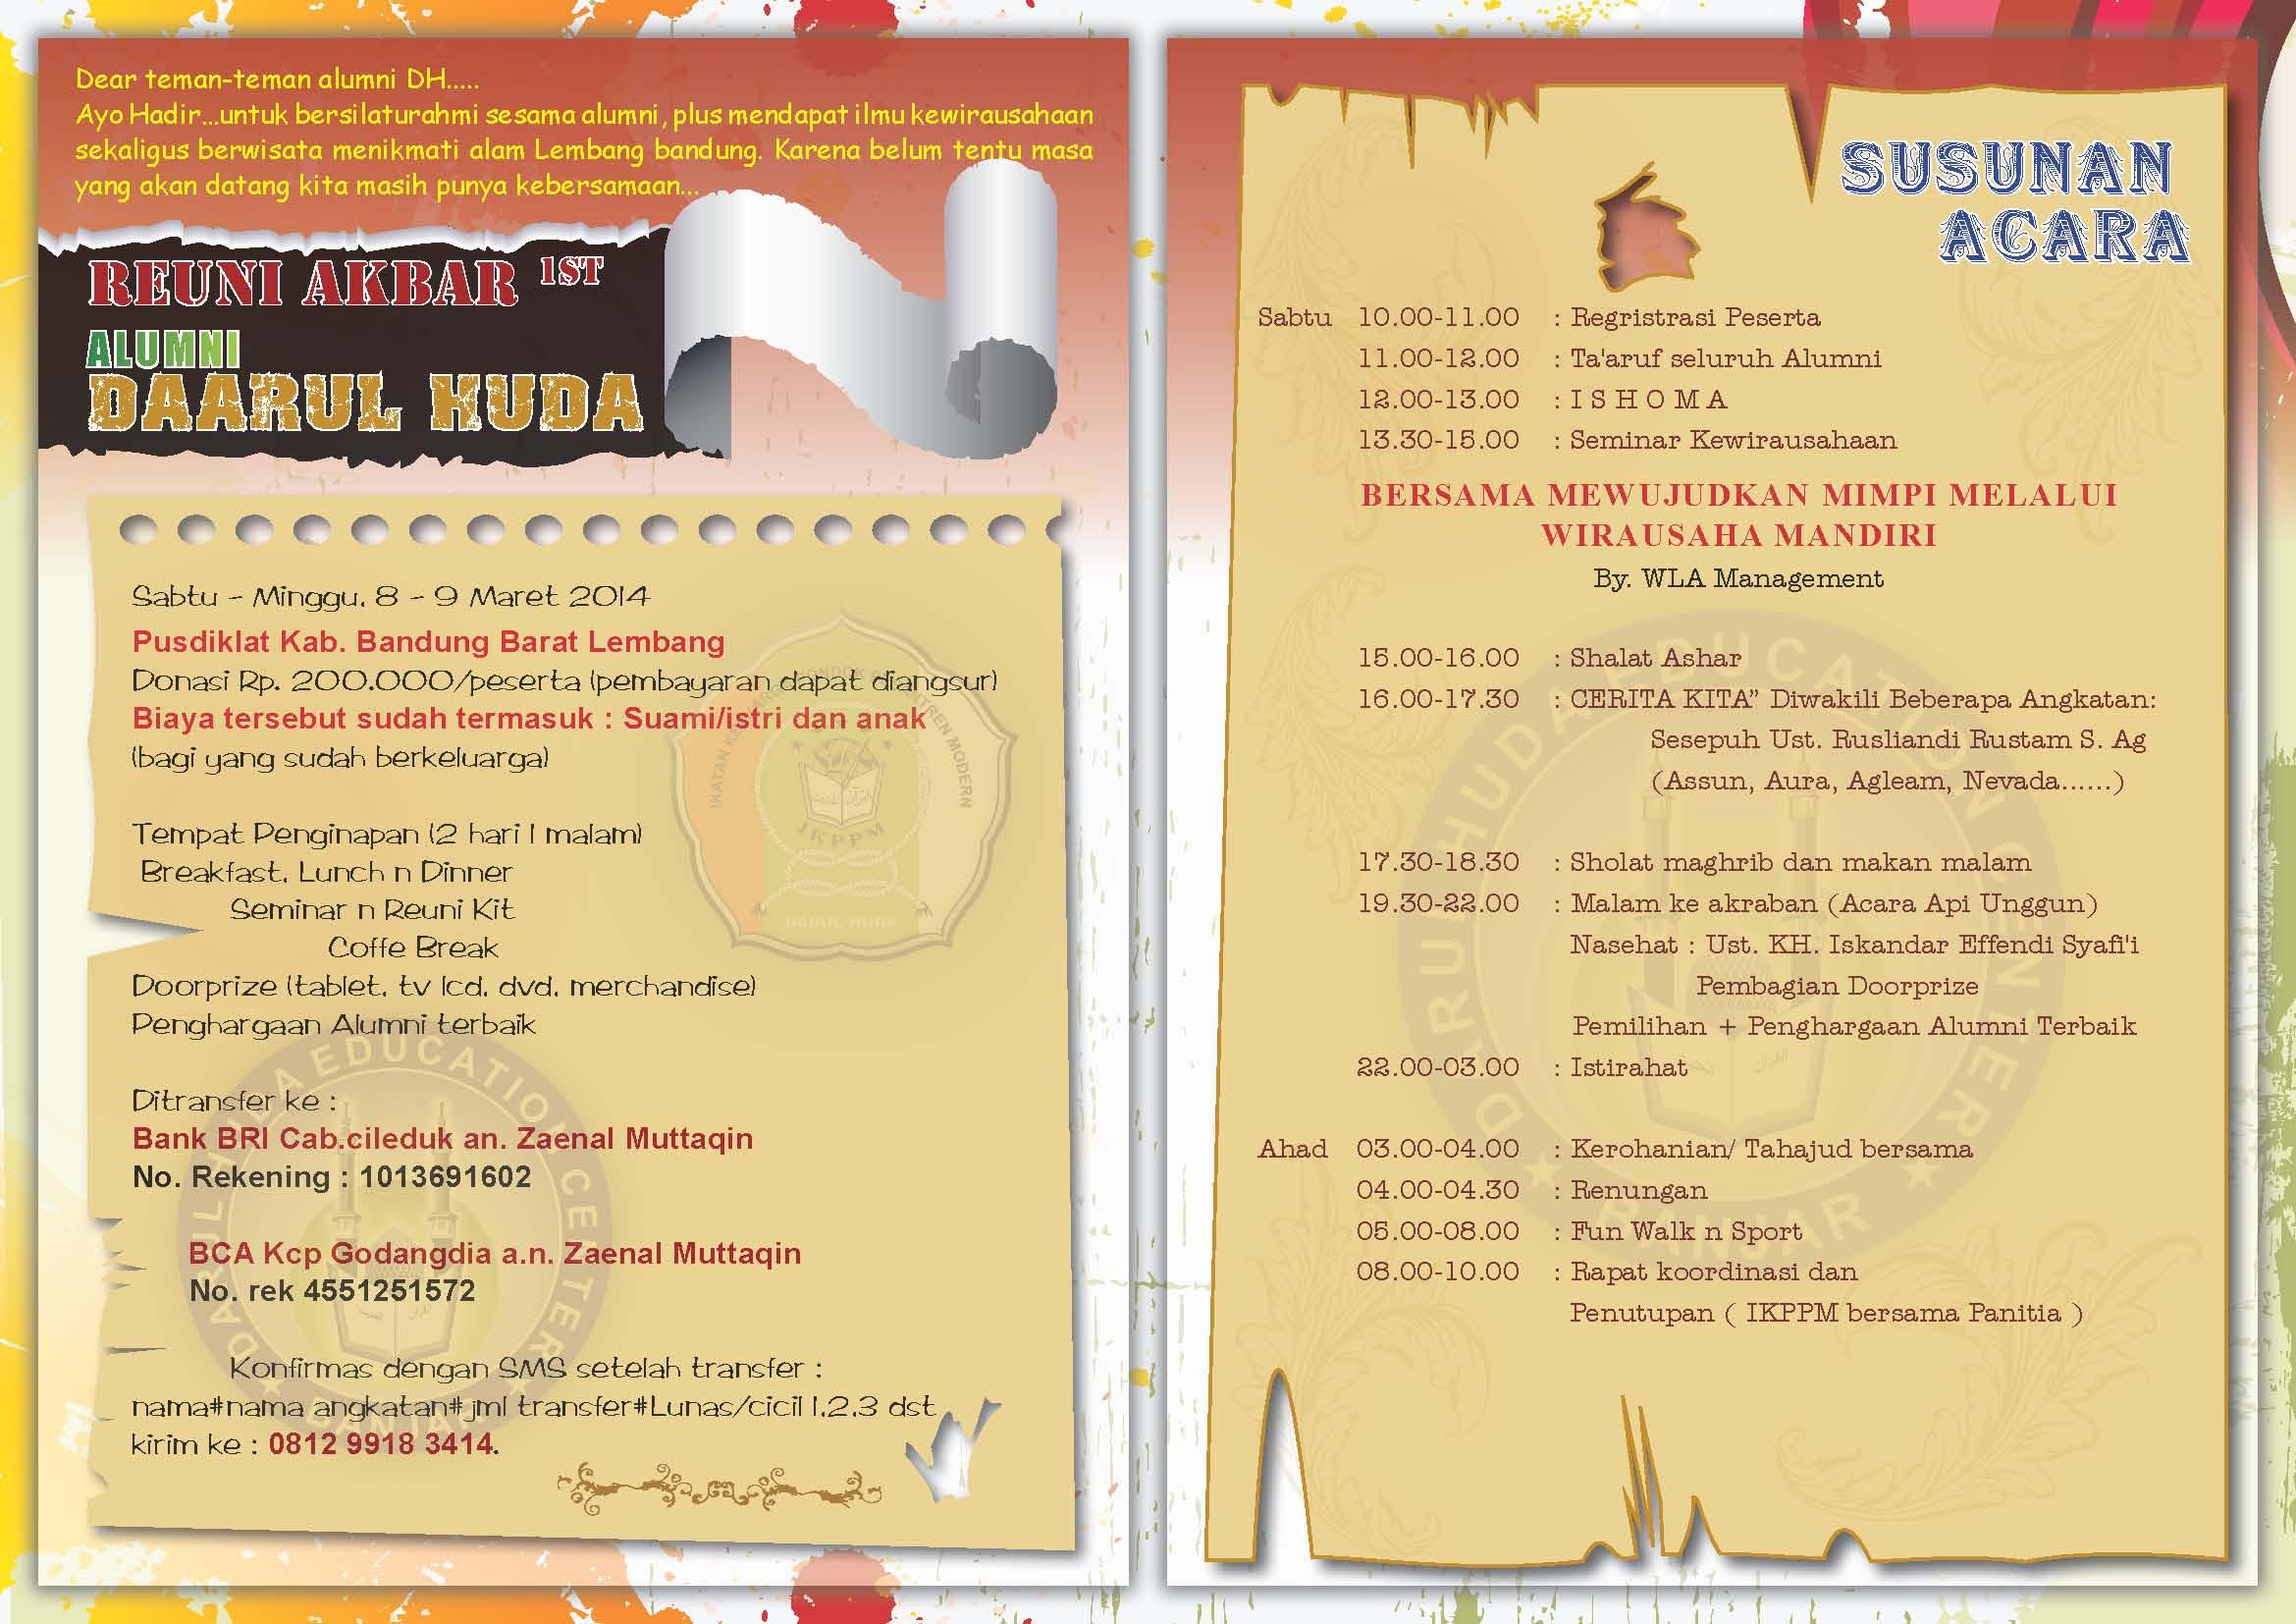 Come On Join Us Temu Kangen Seminar Wirausaha Dan Wisata